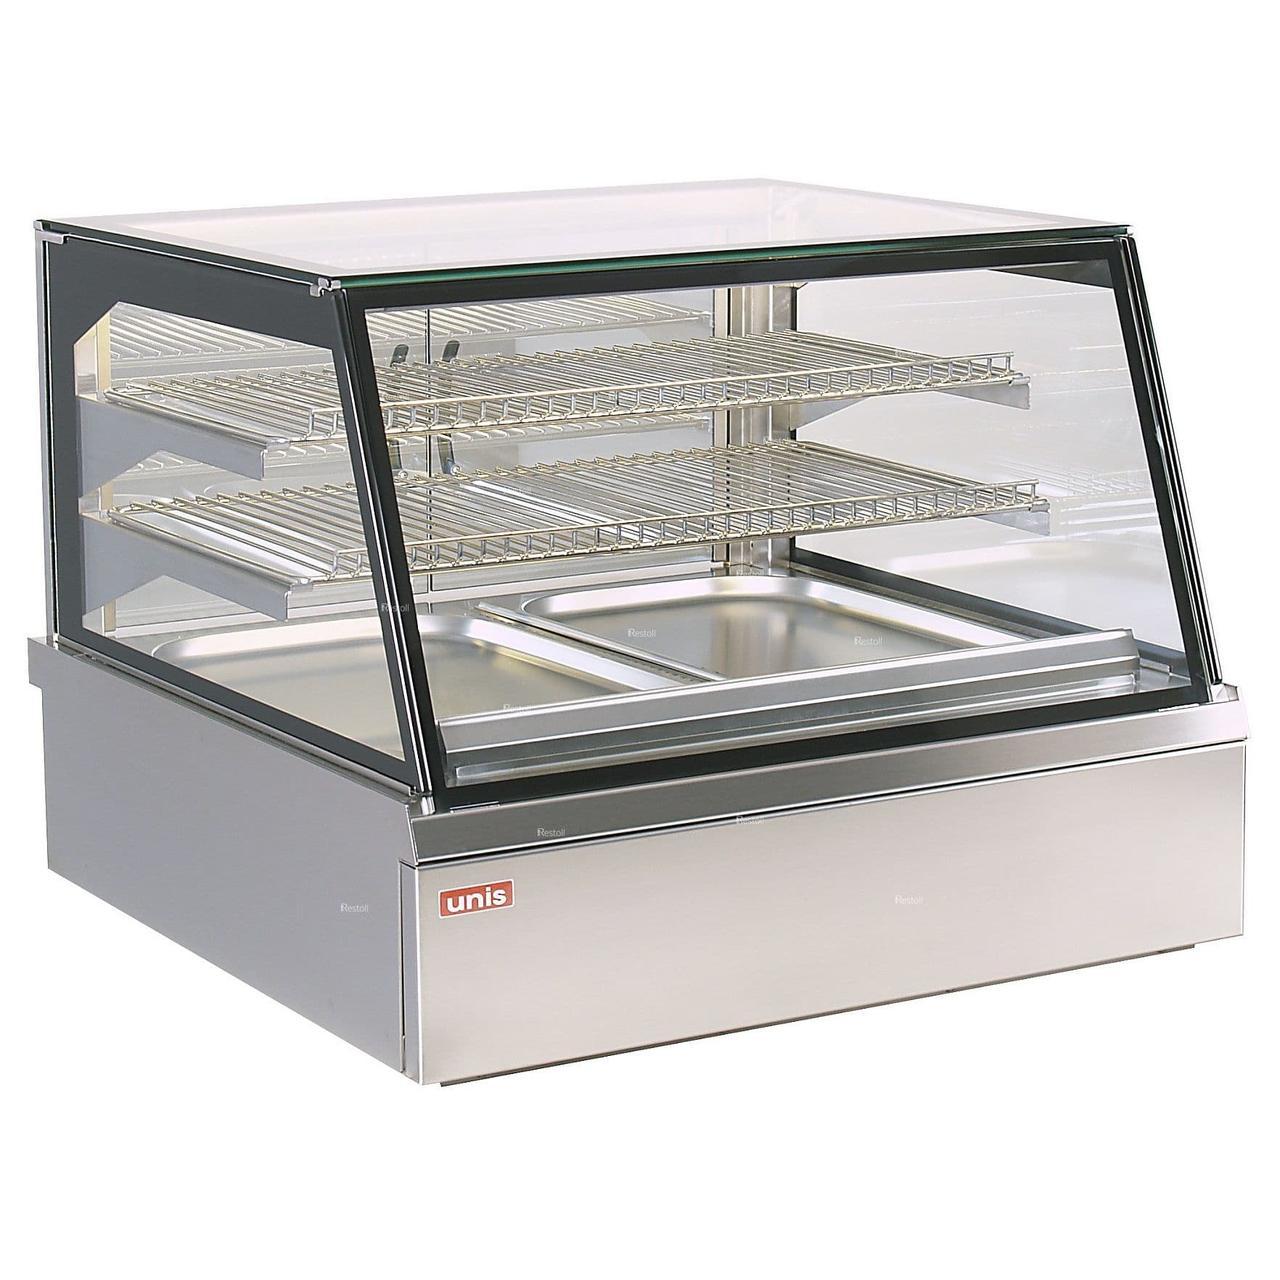 Тепловая витрина UNIS Adda Small Hot 2GN